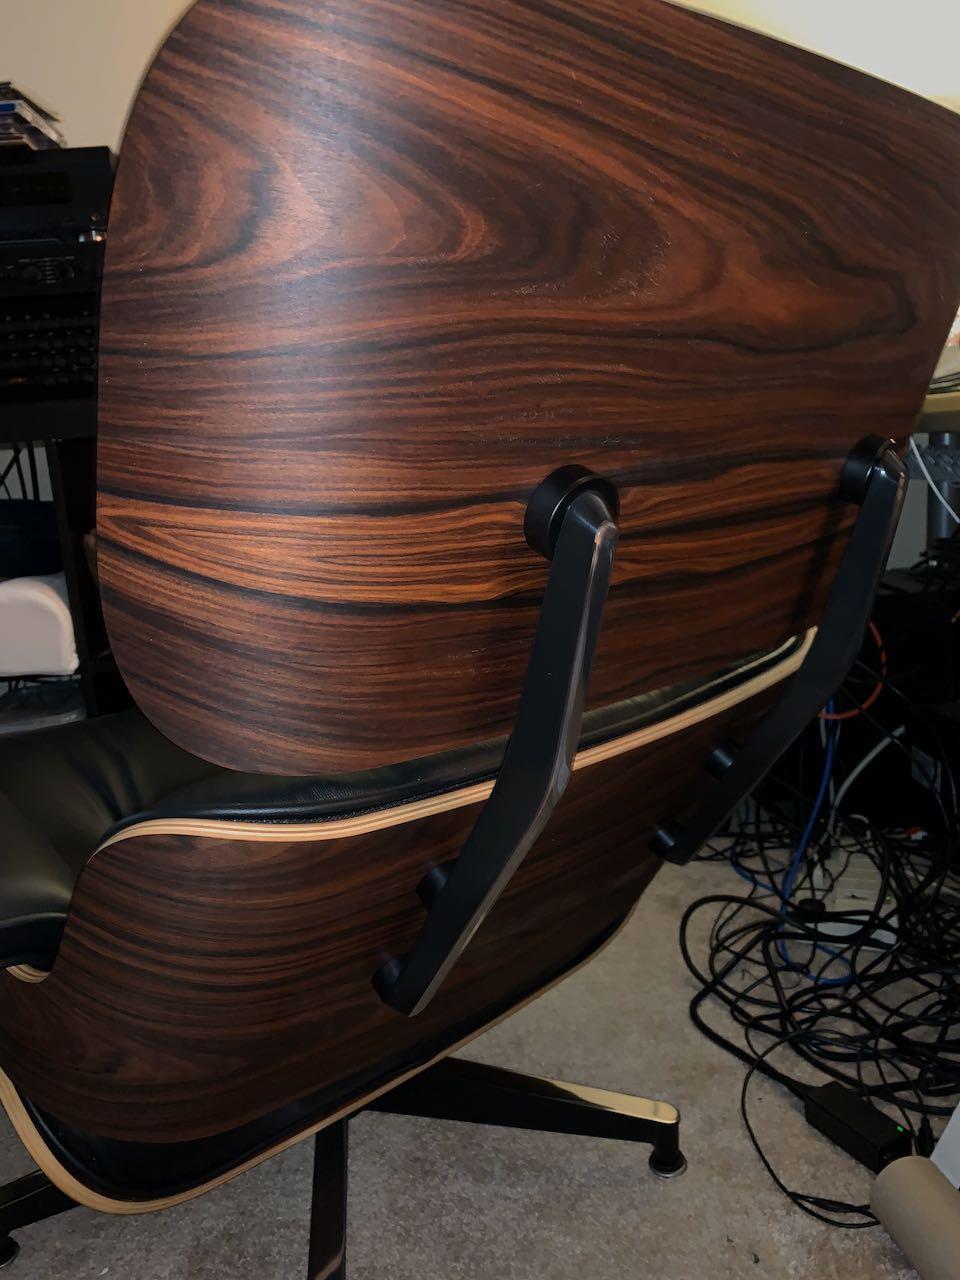 Wooden 2010s Herman Miller Eames Lounge Chair & Ottoman